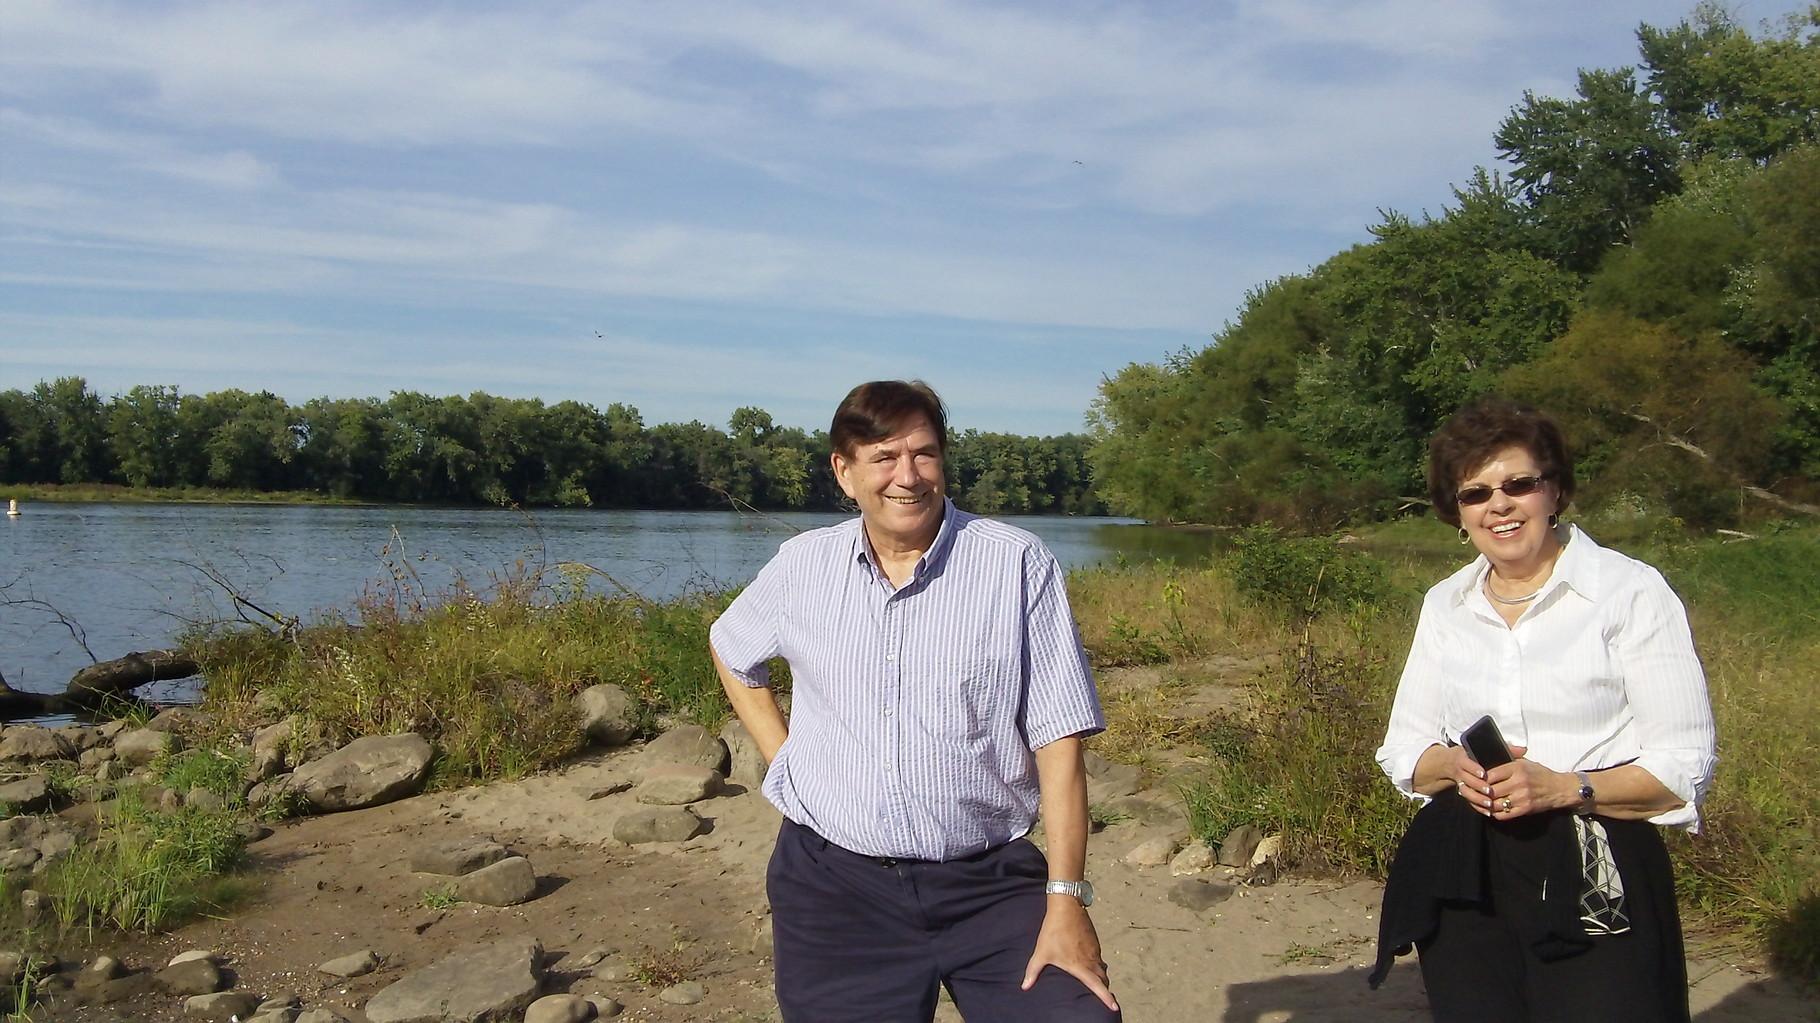 John and Kathy, Conn. River, Sept. 2015